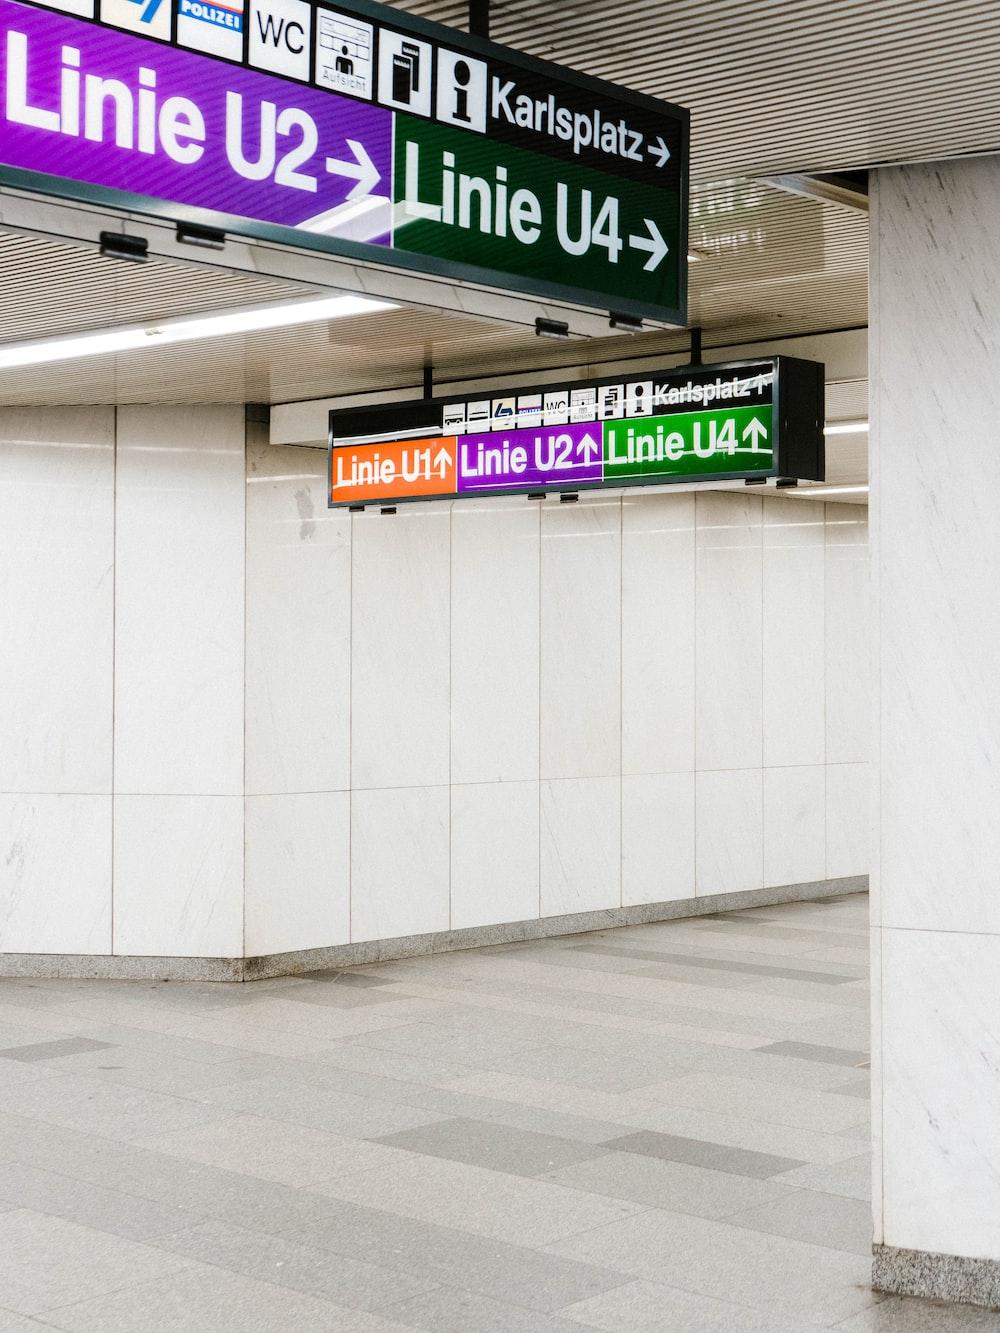 purple and white kanji text signage